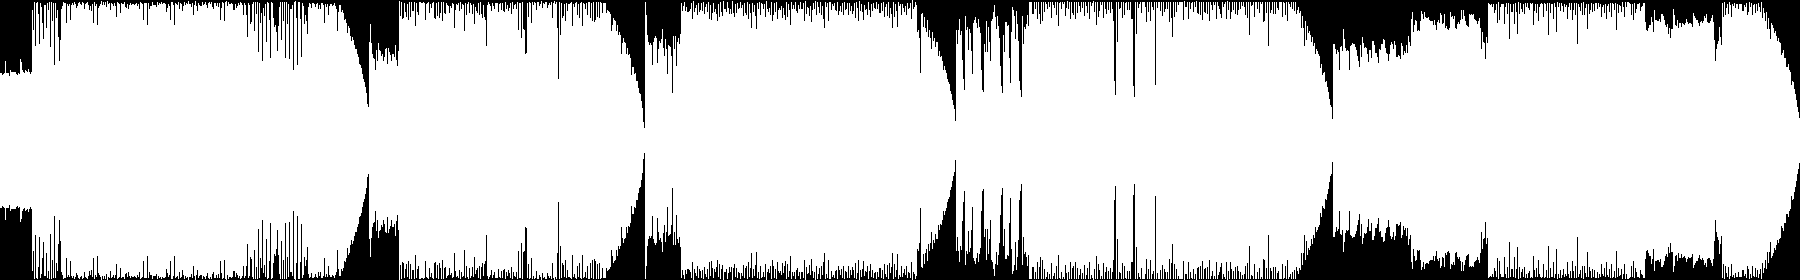 TakiTon audio waveform